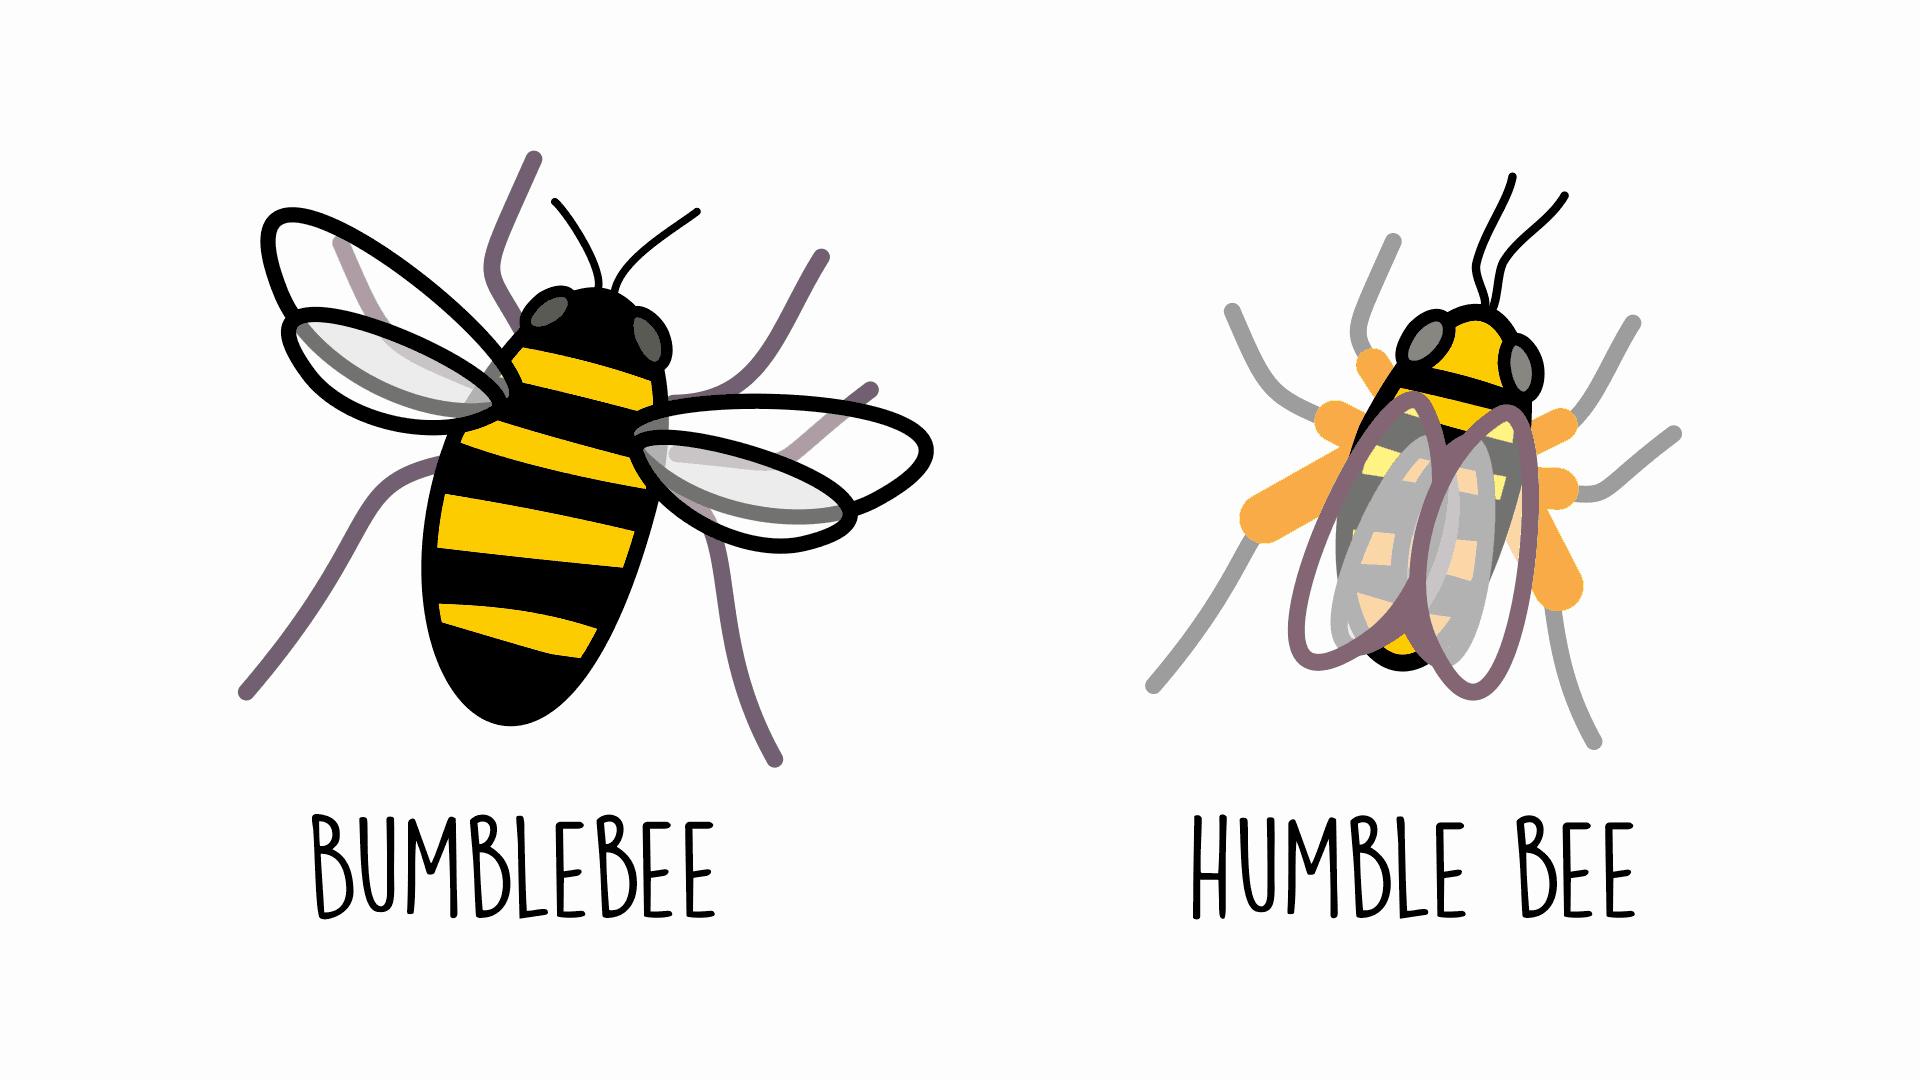 bumblebee-humble-bee-1920-1080